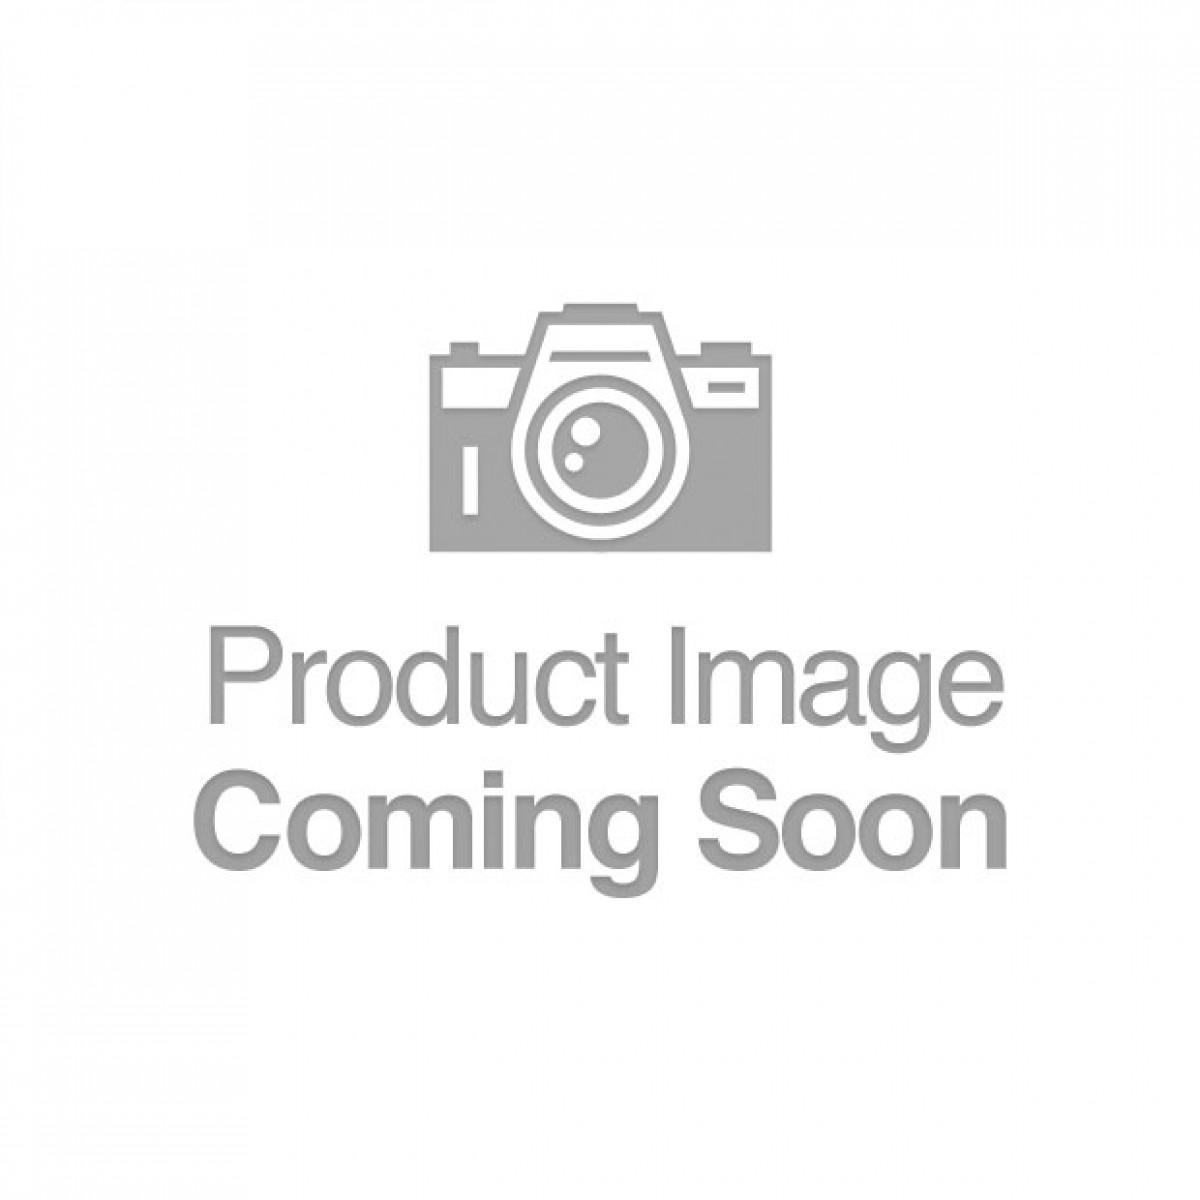 Blush Performance VX6 Vacuum Penis Pump w/Brass Pistol & Pressure Gauge - Clear